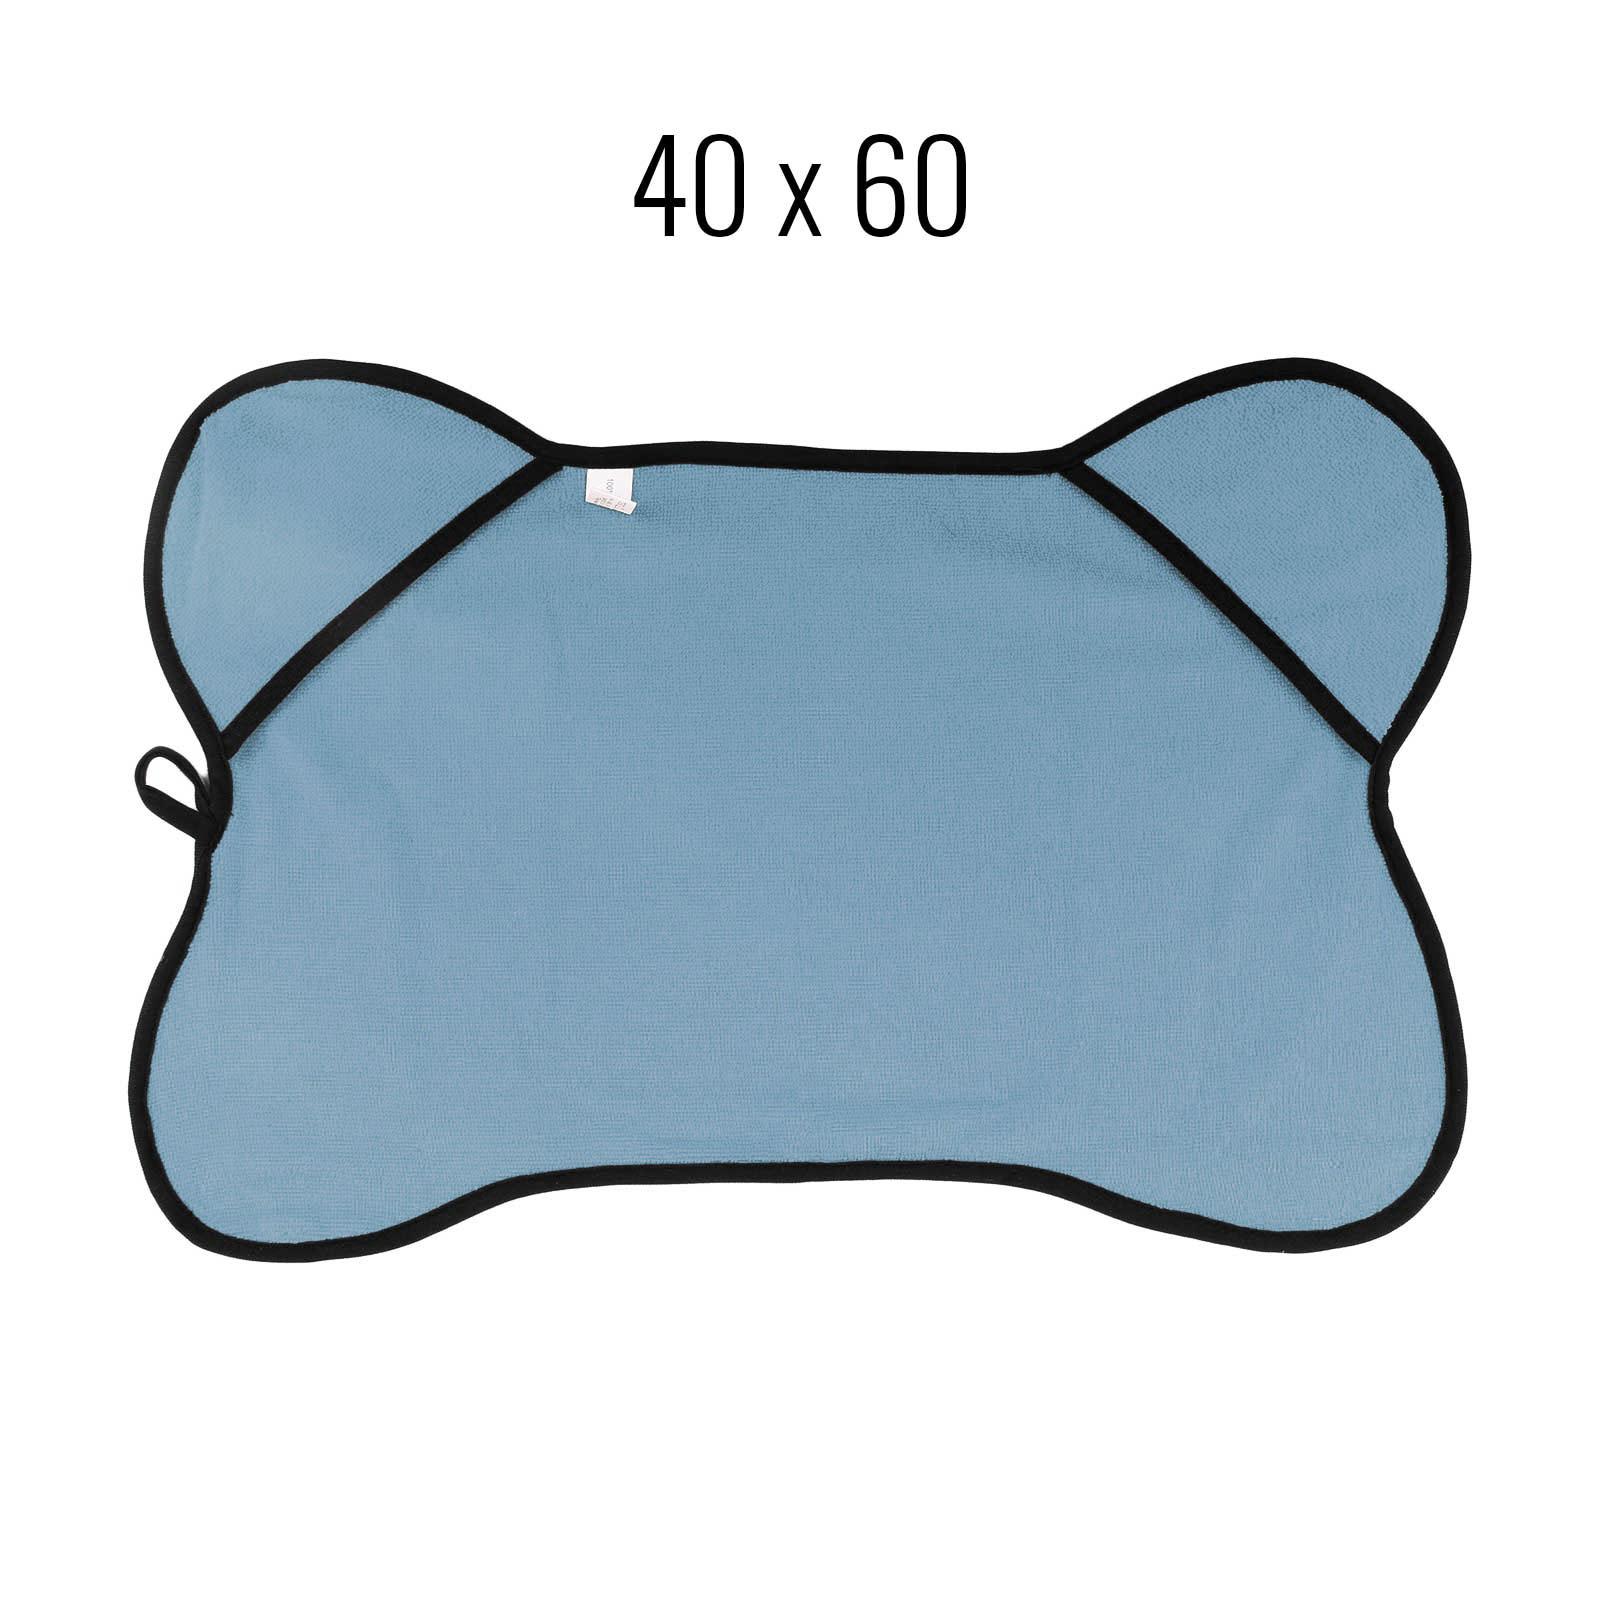 Haustierhandtuch 40x60 cm blau grau